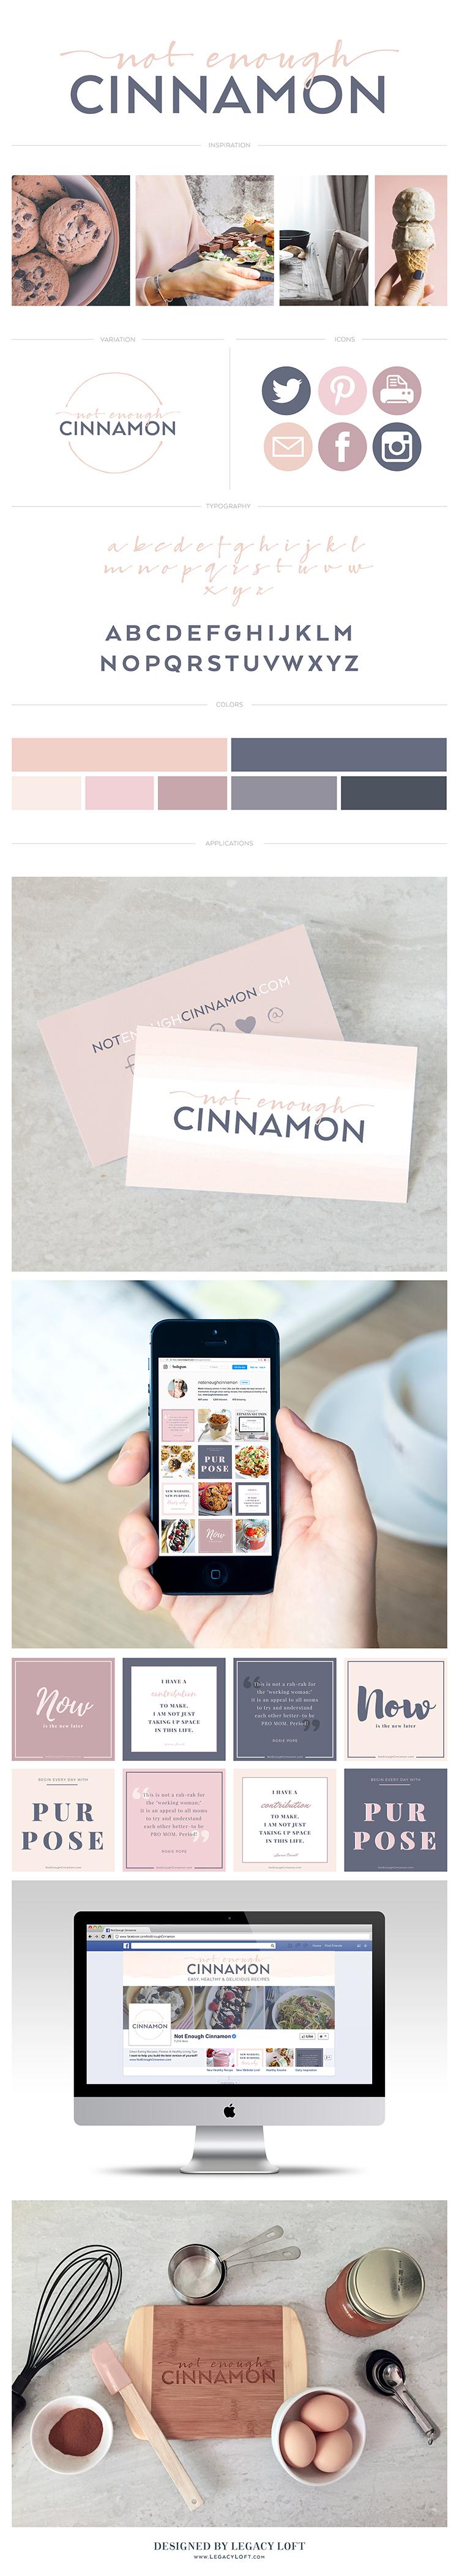 Not-Enough-Cinnamon-brand-board.jpg